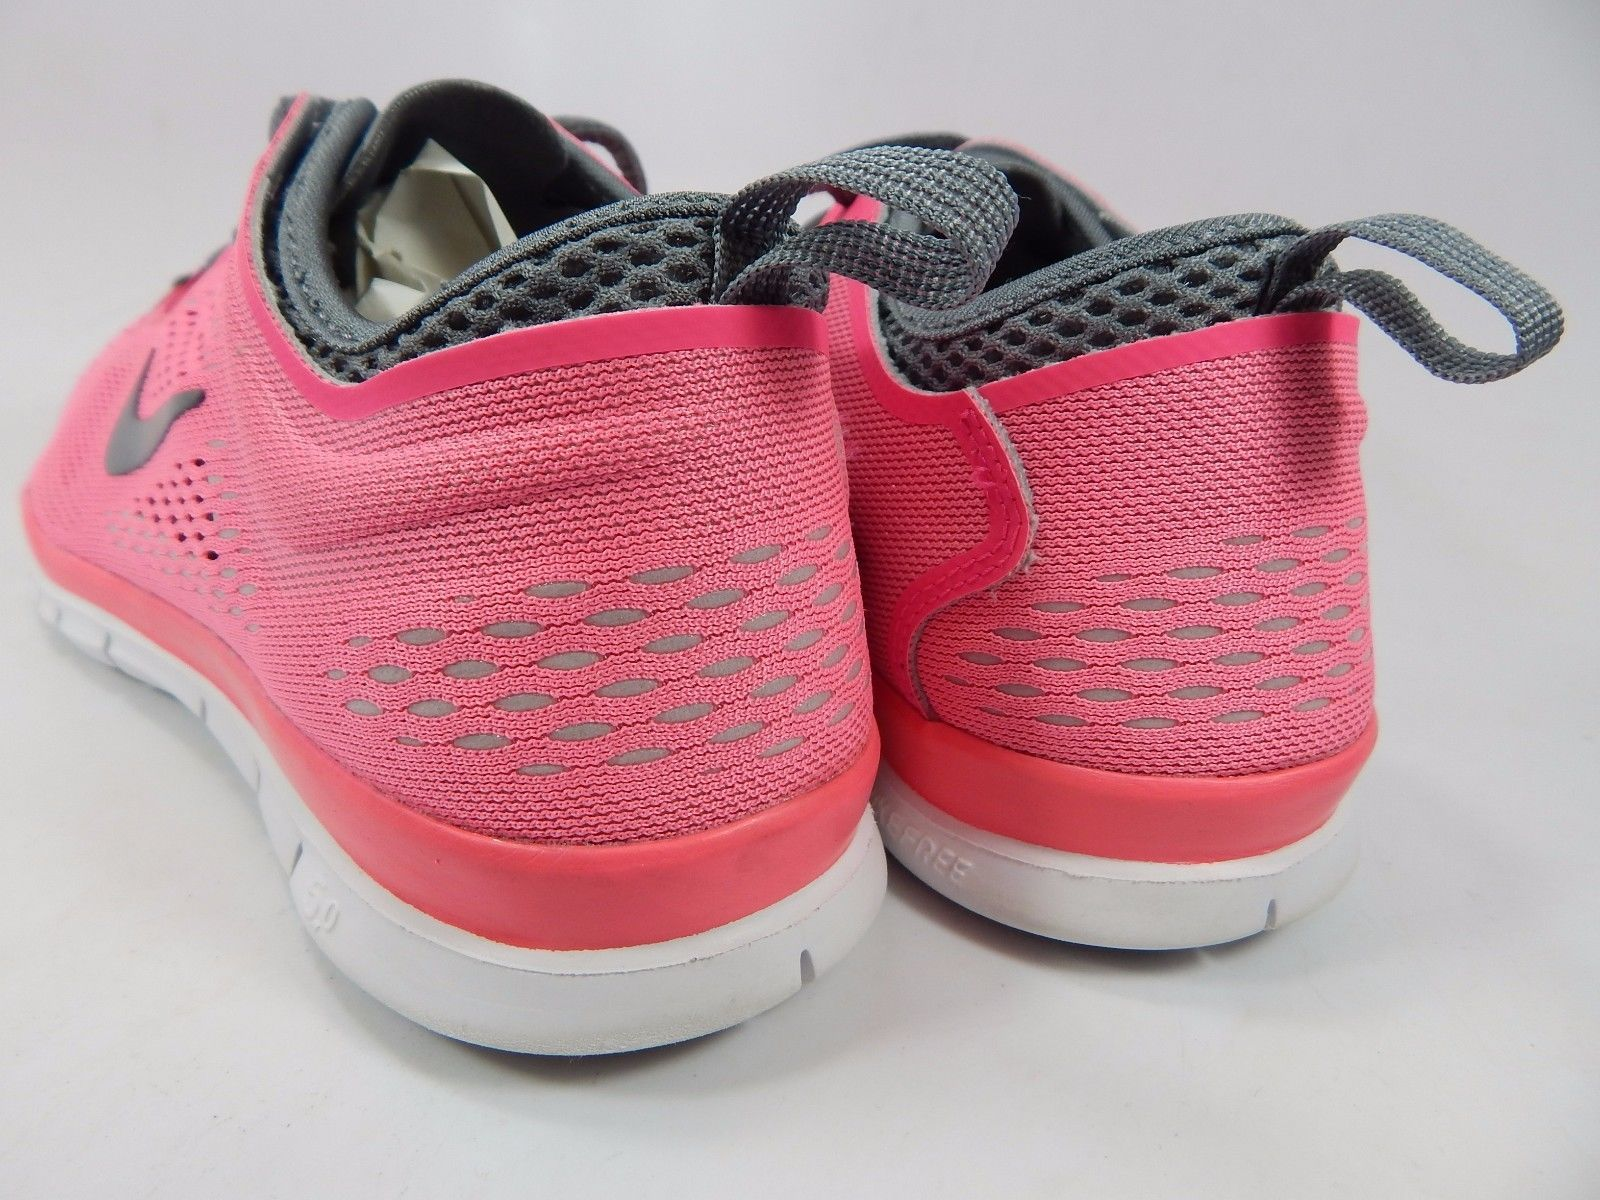 Nike Free 5.0 TR Fit 4 Women's Running Shoes Sz US 9 M (B) EU 40.5 Pink